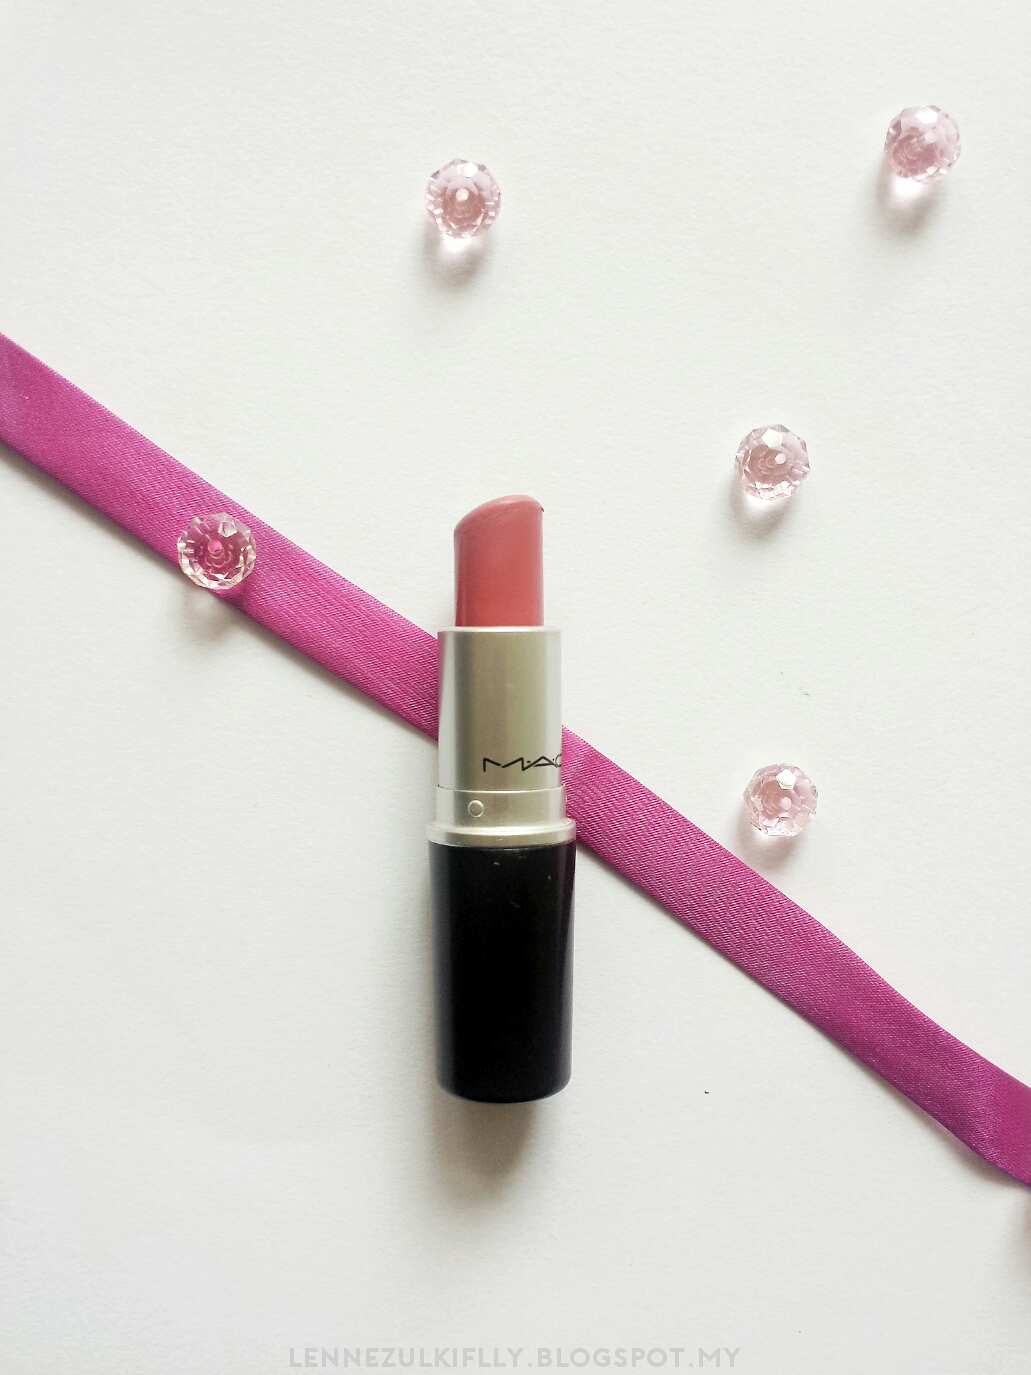 M.A.C 'Please Me' Matte Lipstick | Lenne Zulkiflly